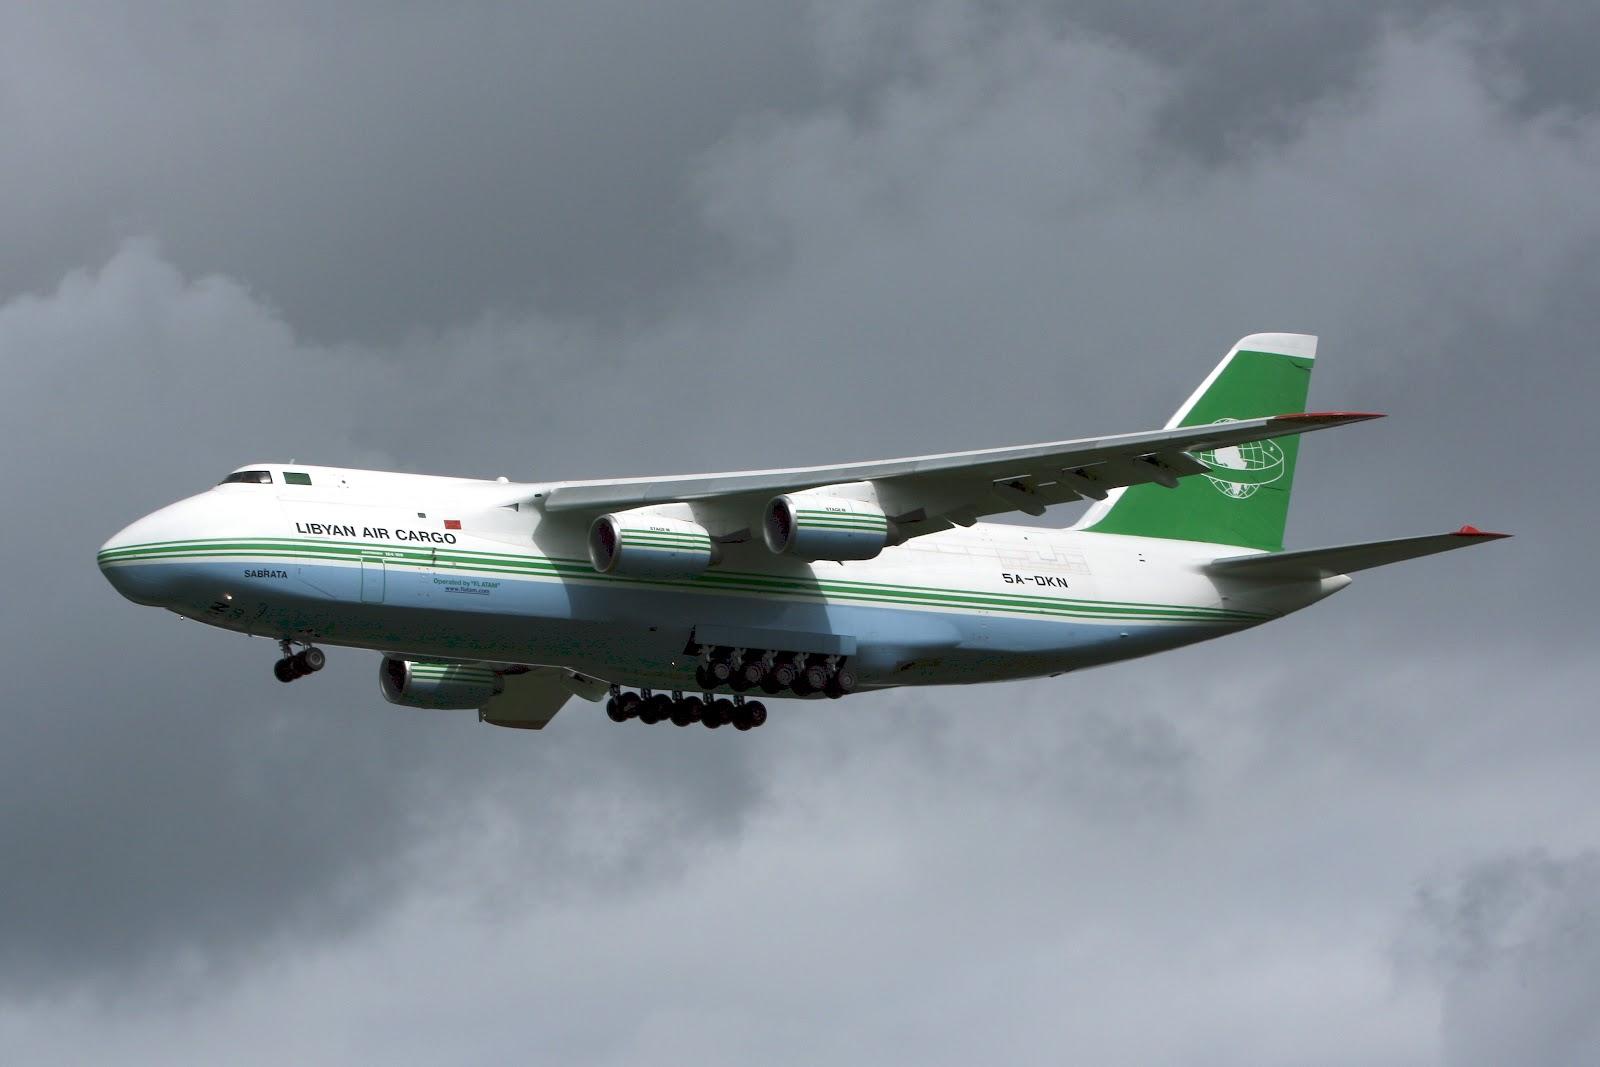 Libyan Arab Air Cargo – wallpaperstone.blogspot.com